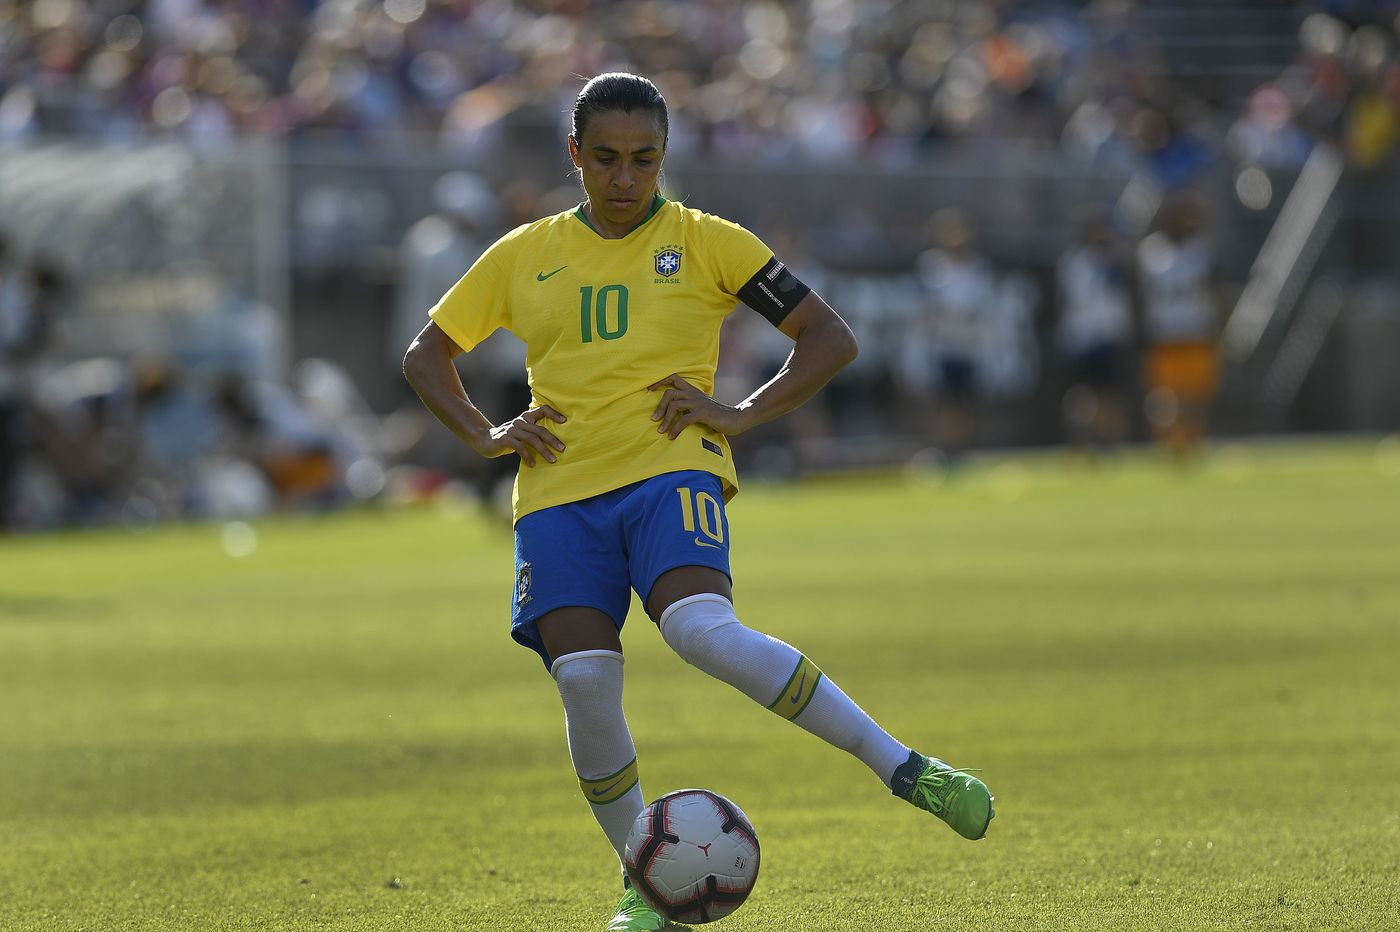 Brazil coach says 'Marta is still Marta' as World Cup nears